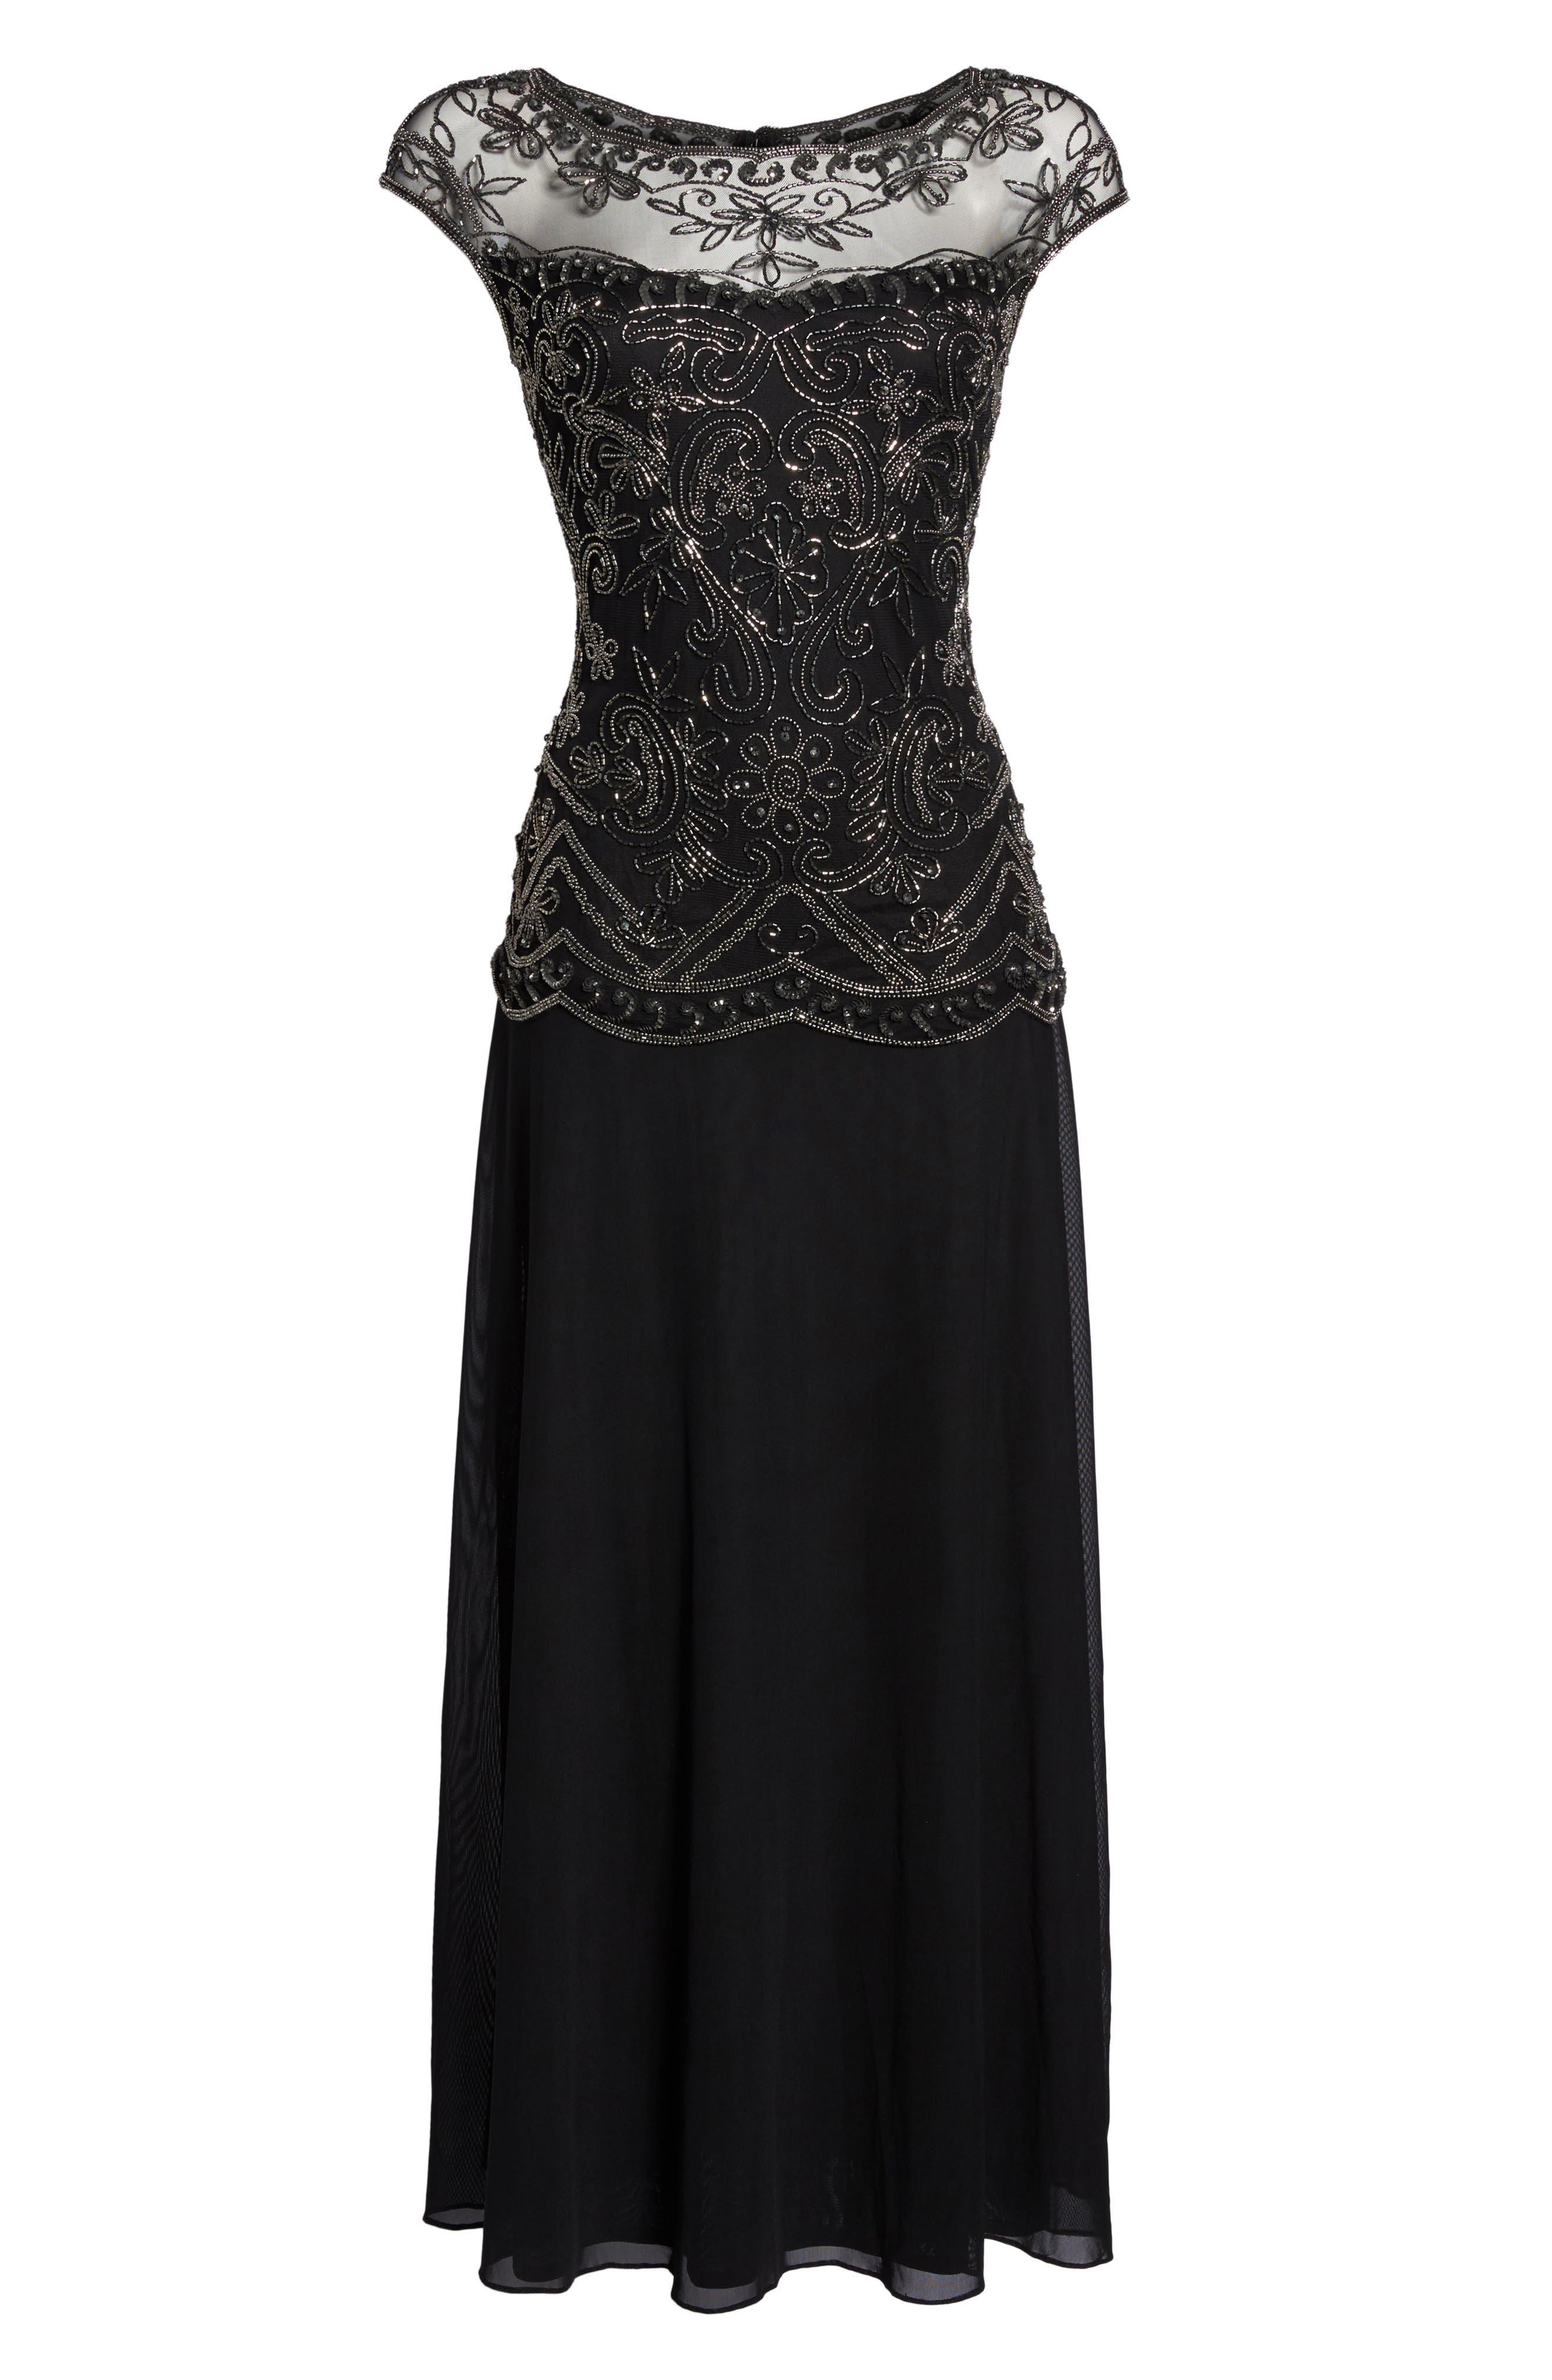 Embellished Cap Sleeve Long Dress,                             Alternate thumbnail 6, color,                             Black